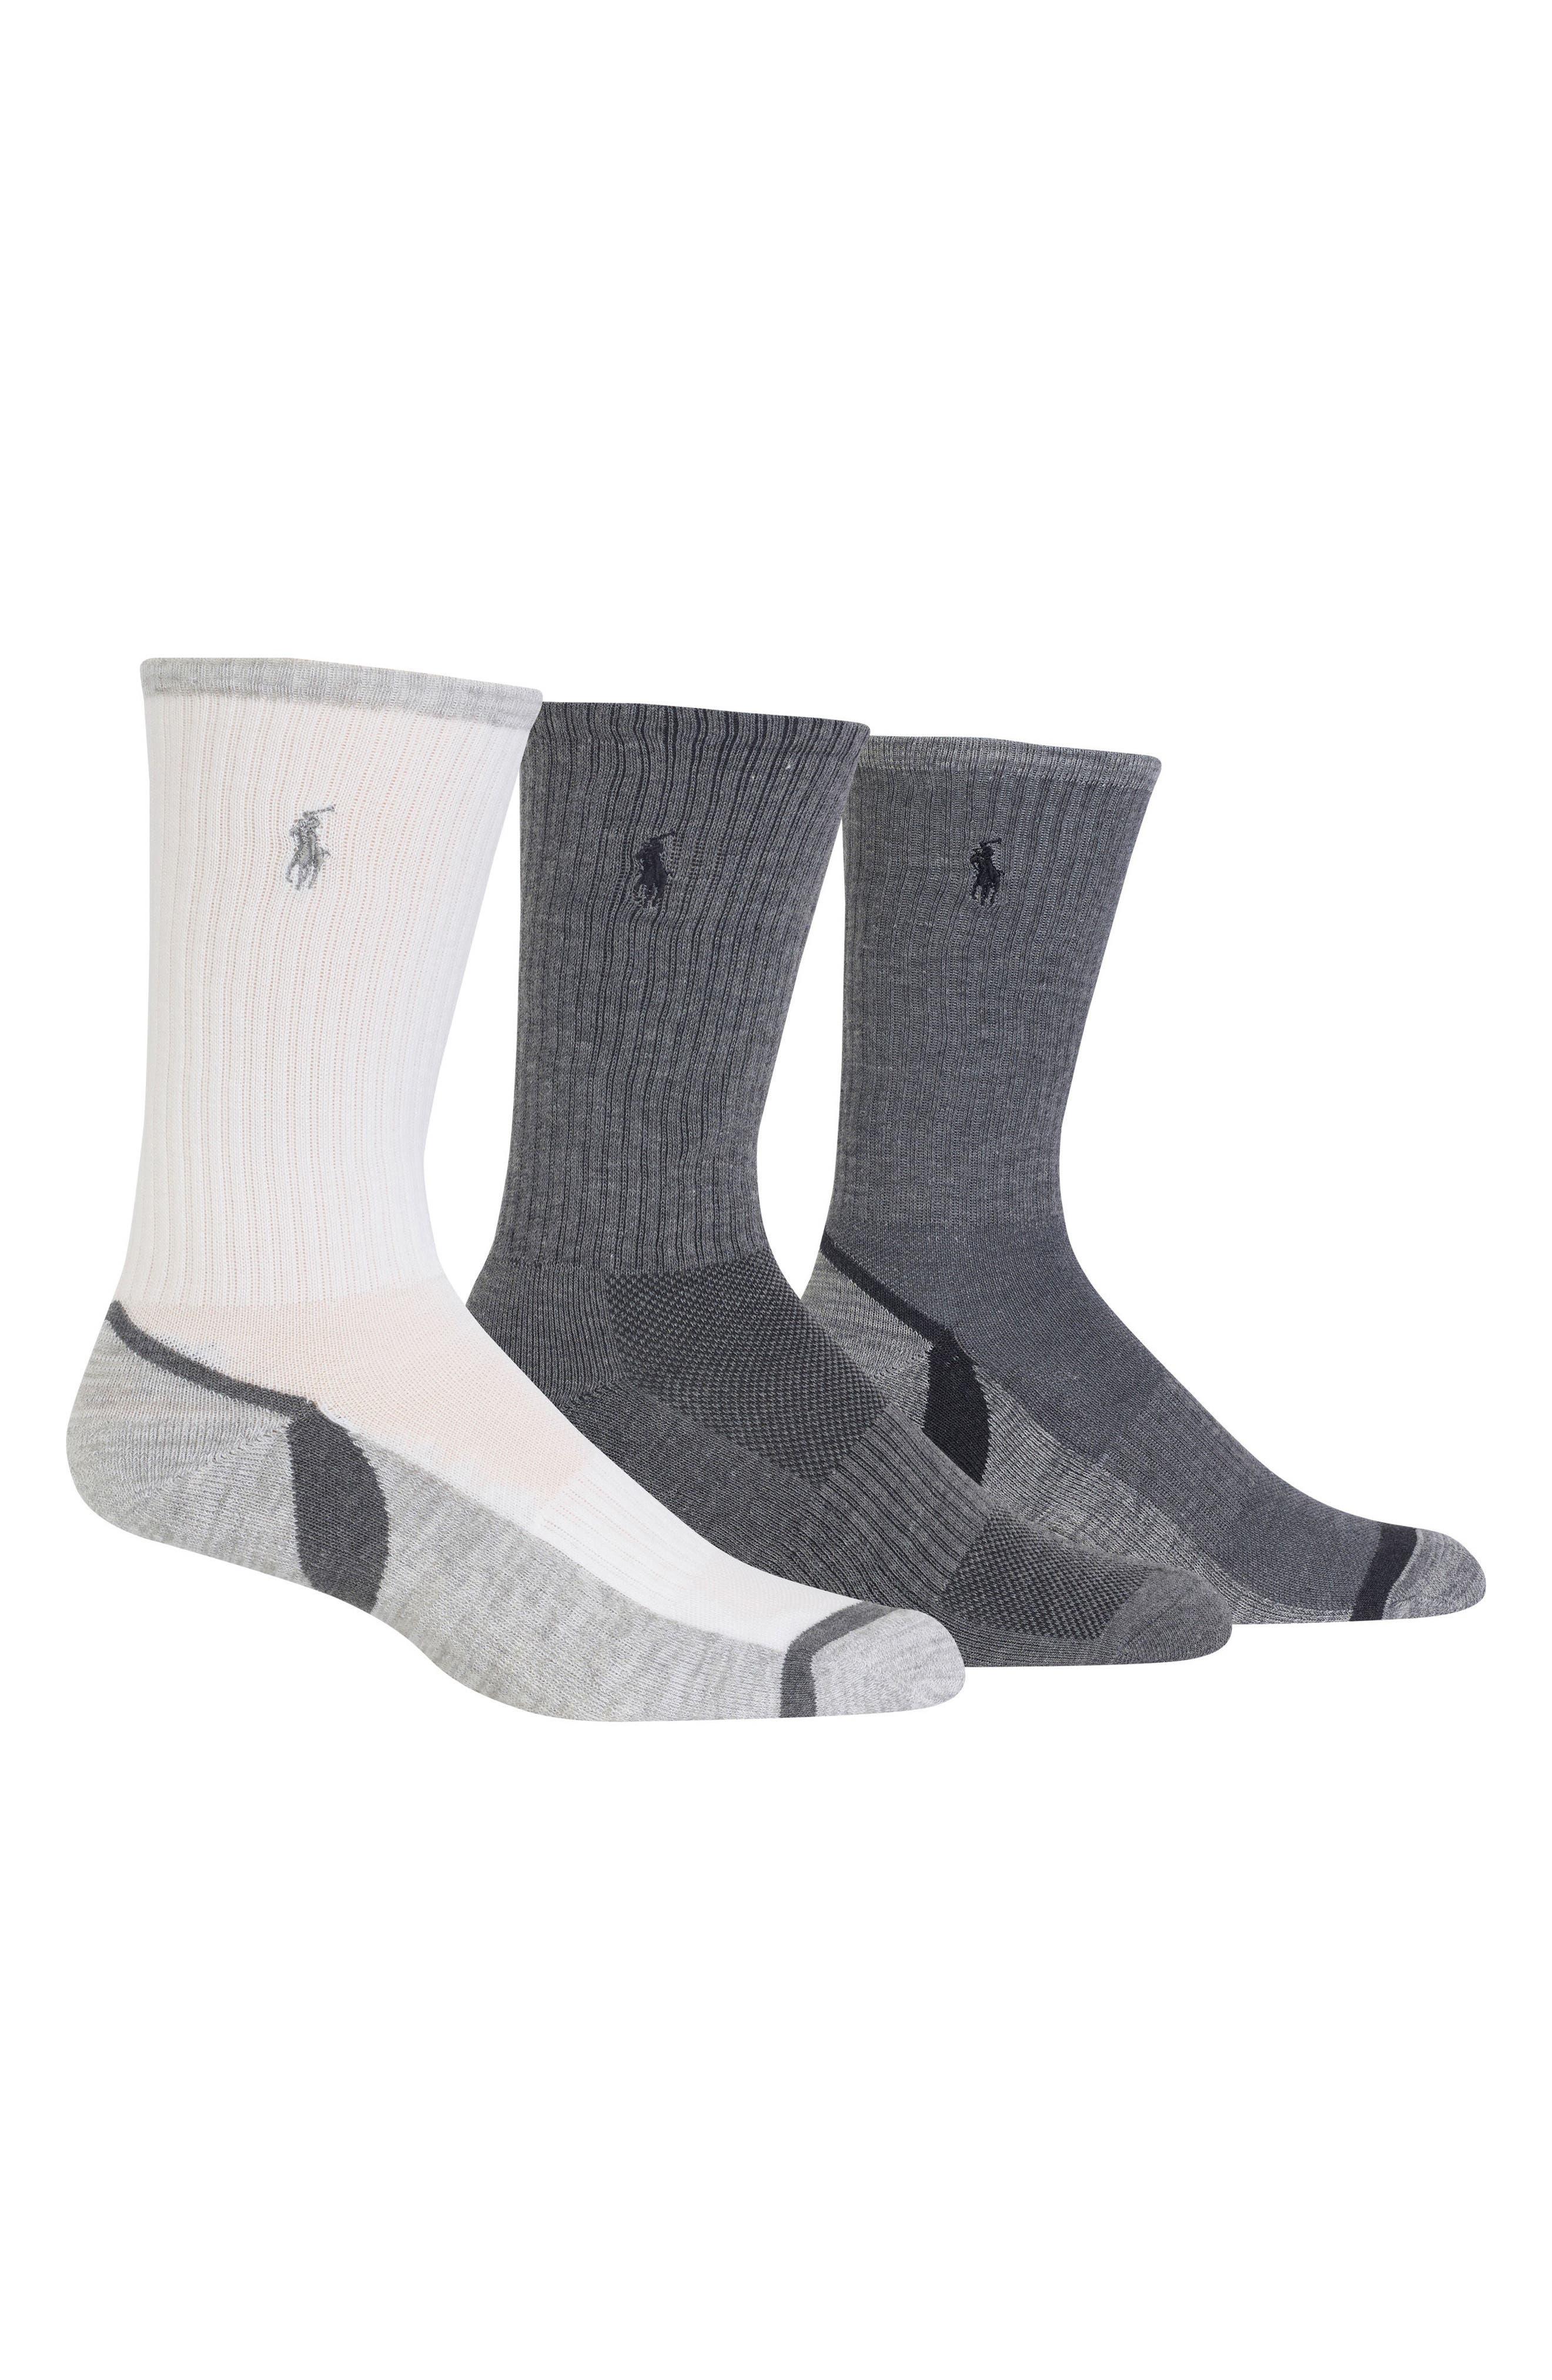 3-Pack Athletic Socks,                             Main thumbnail 1, color,                             020